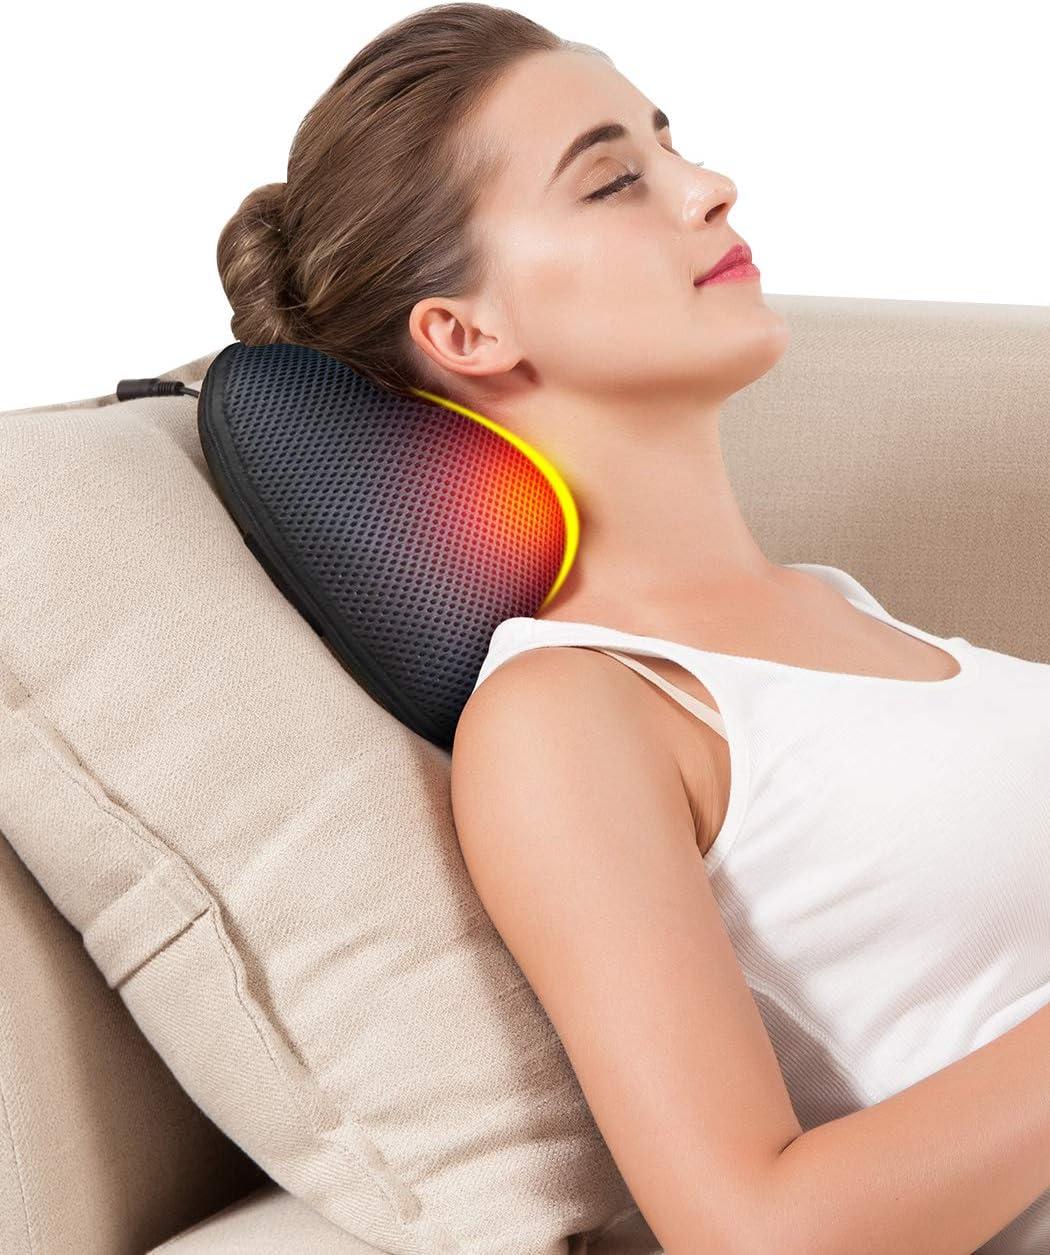 Kim Carrey 3D deep Tissue Electric Massage Pillow for Neck, Massage for Neck and Shoulder,Protable Massager Pressure Point for Neck,Shoulder,Waist,Leg,Foot,Lower Back.